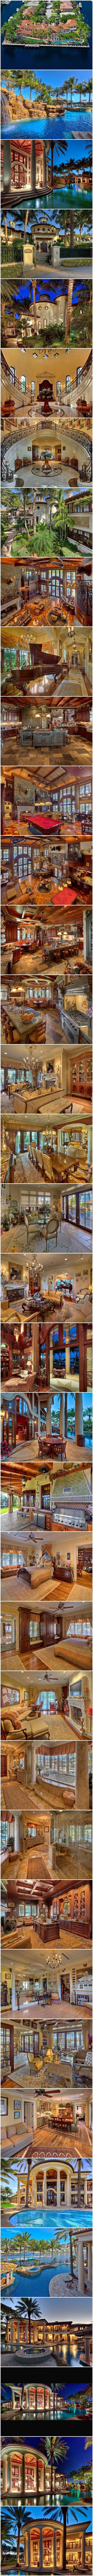 Real Estate: Mansion Dreams, Dream Homes, Luxury Homes, Beautiful Dream, My Dream House, Dream Houses, Billionaire Lifestyle